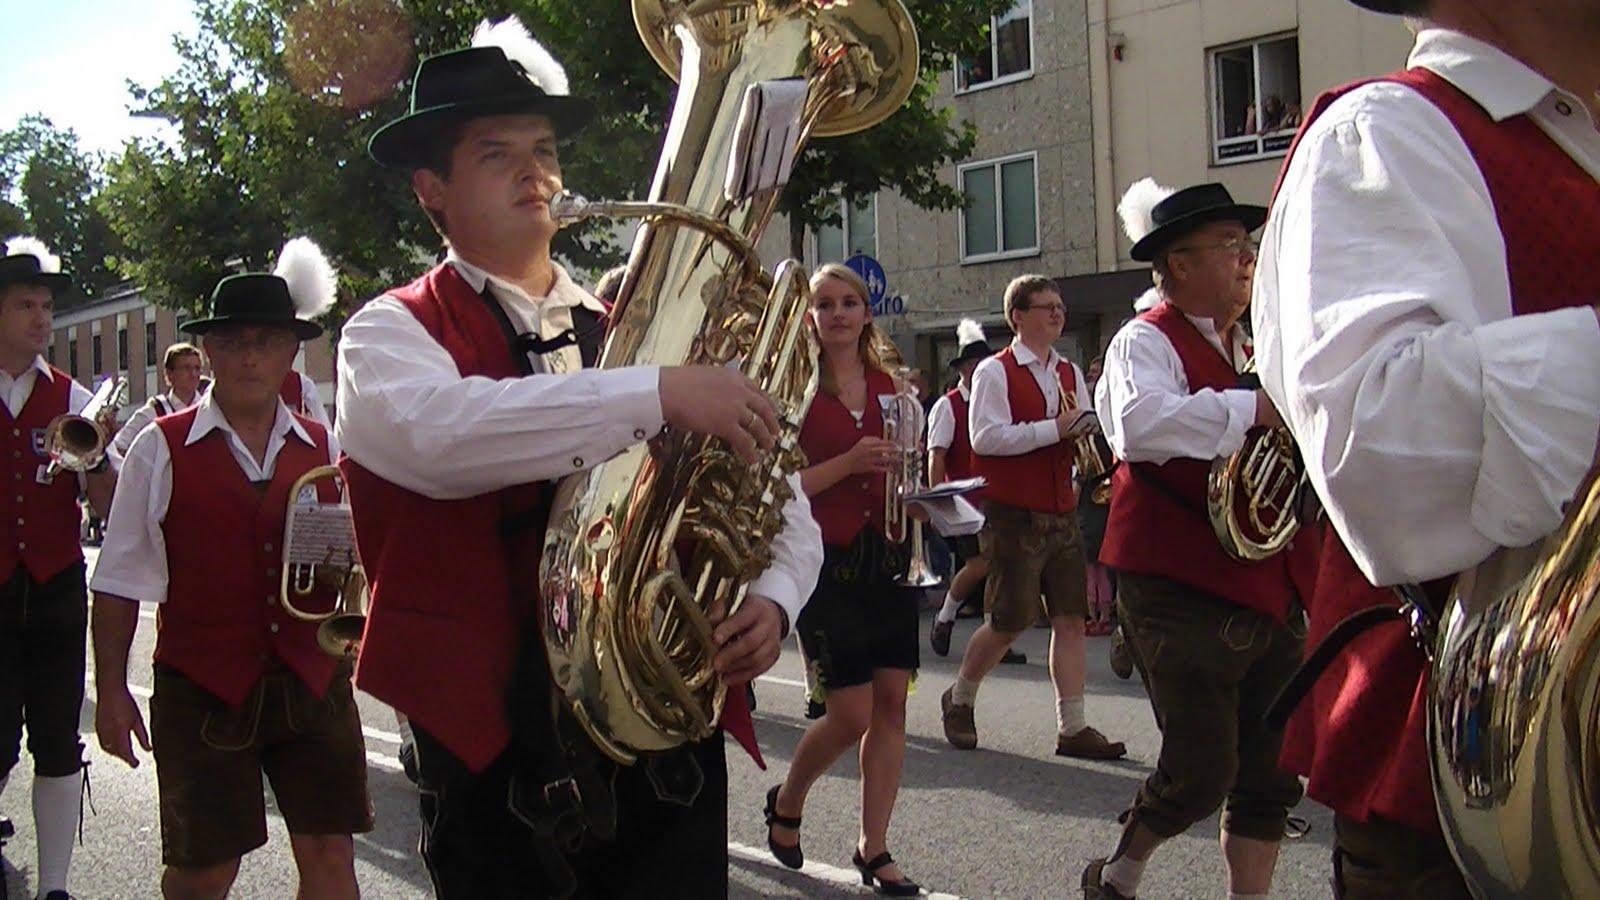 Schwer mit den Schätzen des Orients beladen, Немецкая народная песня, военный марш, солдатская песняя